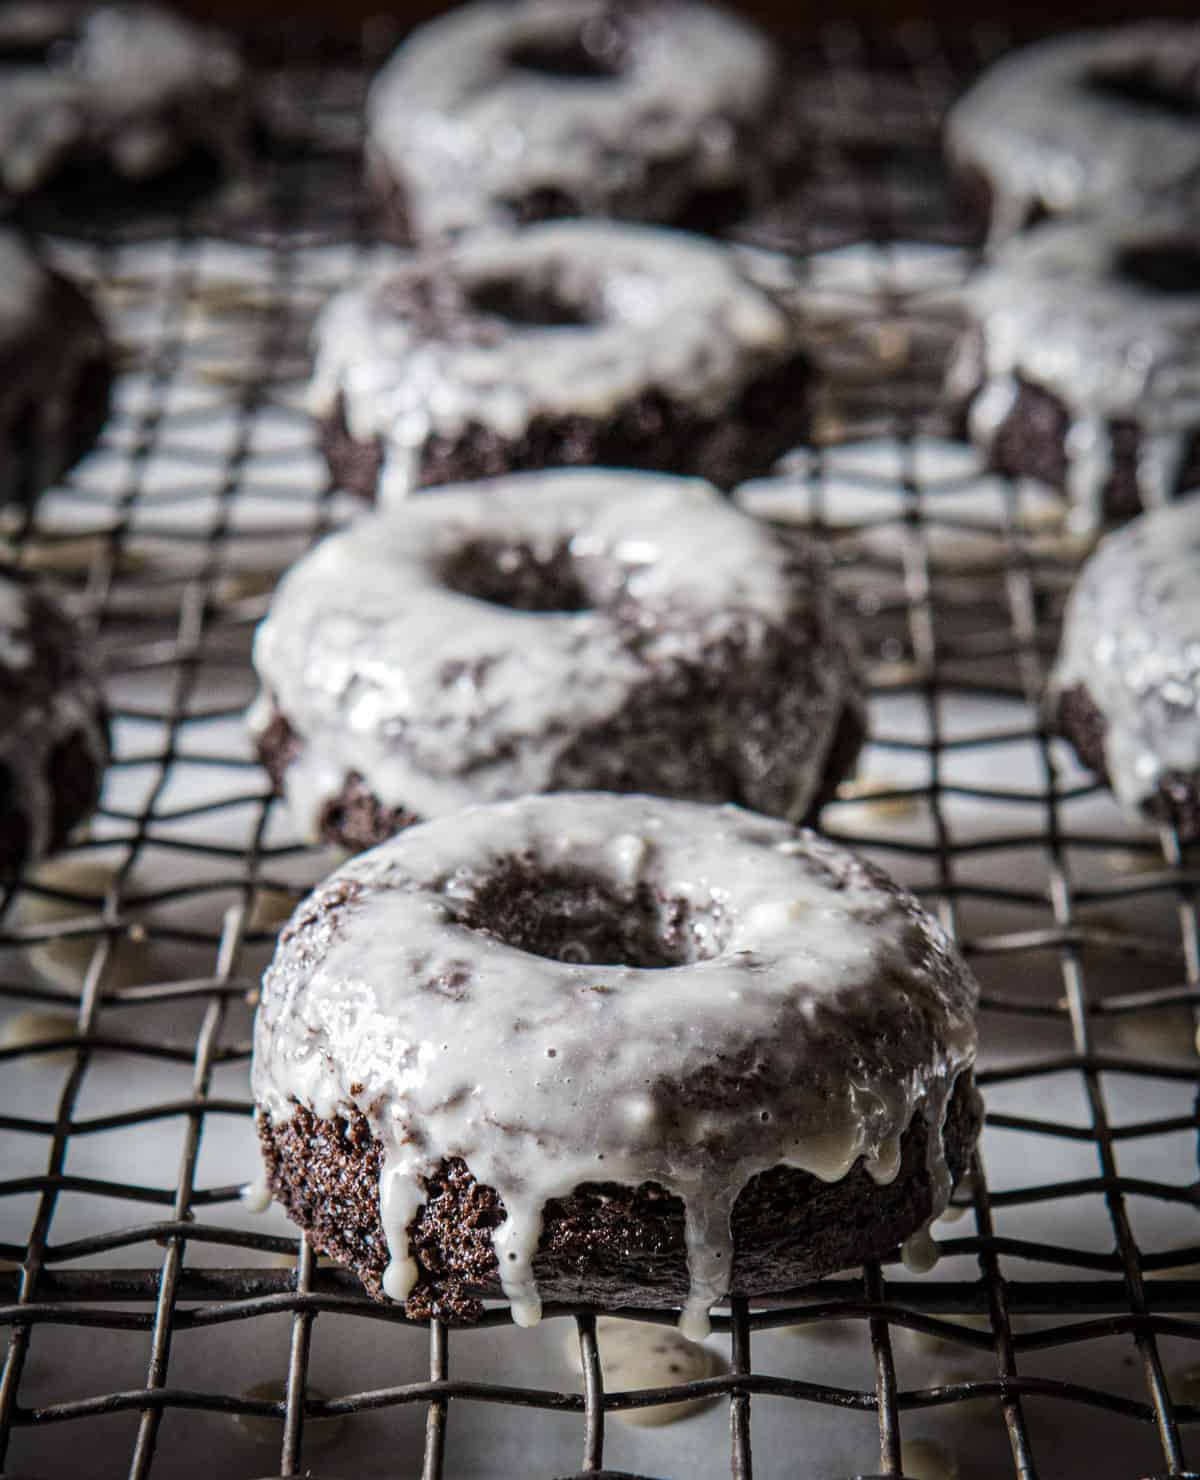 Glazed grain-free chocolate doughnuts on a cooling rack.